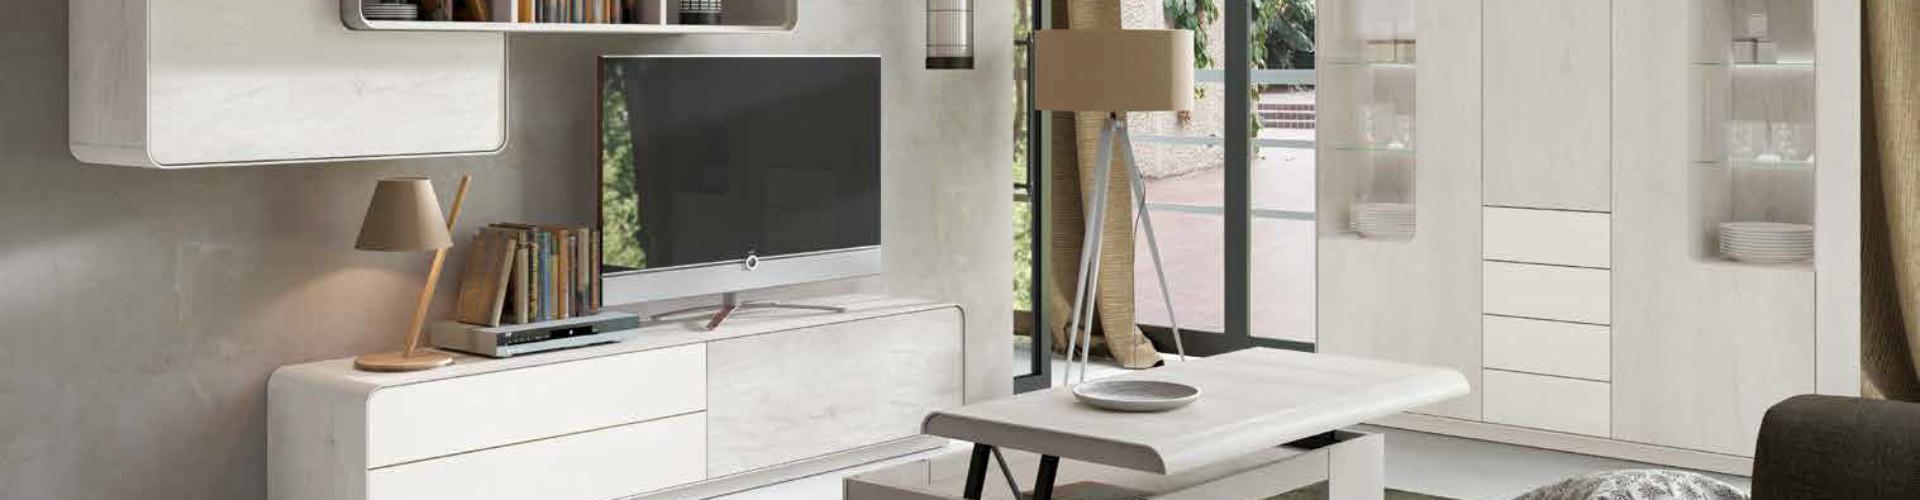 Mesas de centro para salones modernos en Muebles Moya